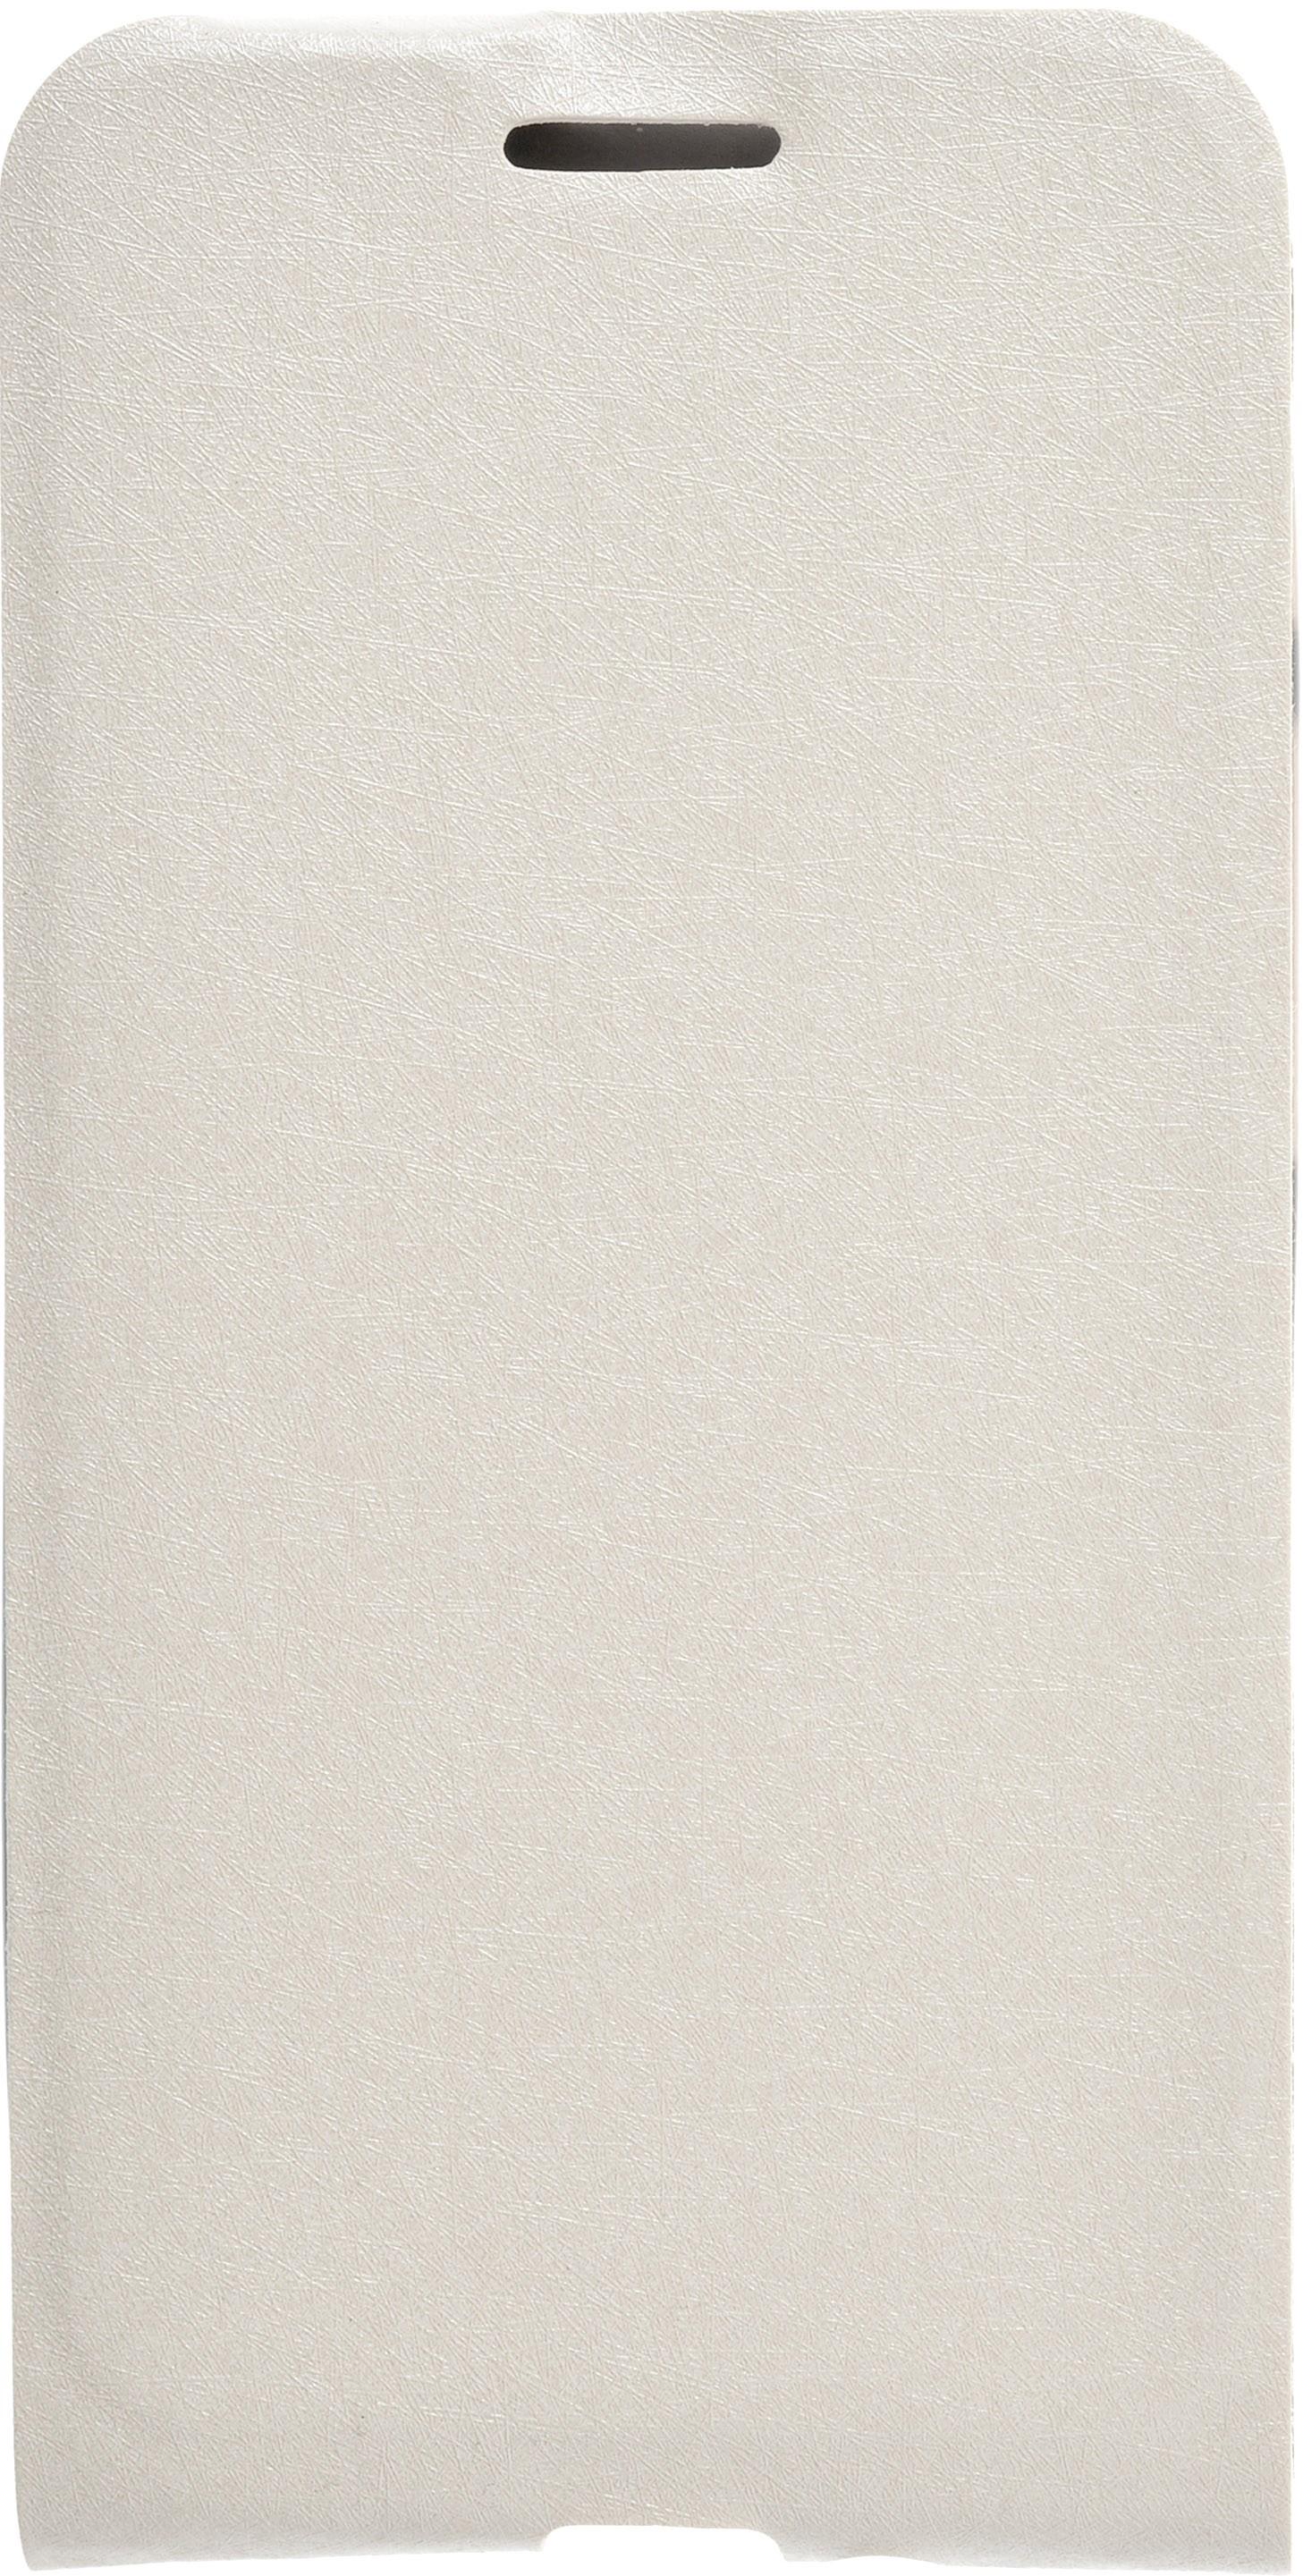 Чехол skinBOX для ASUS ZC451TG, 2000000091334, белый skinbox 4people чехол для asus zenfone go zc451tg black